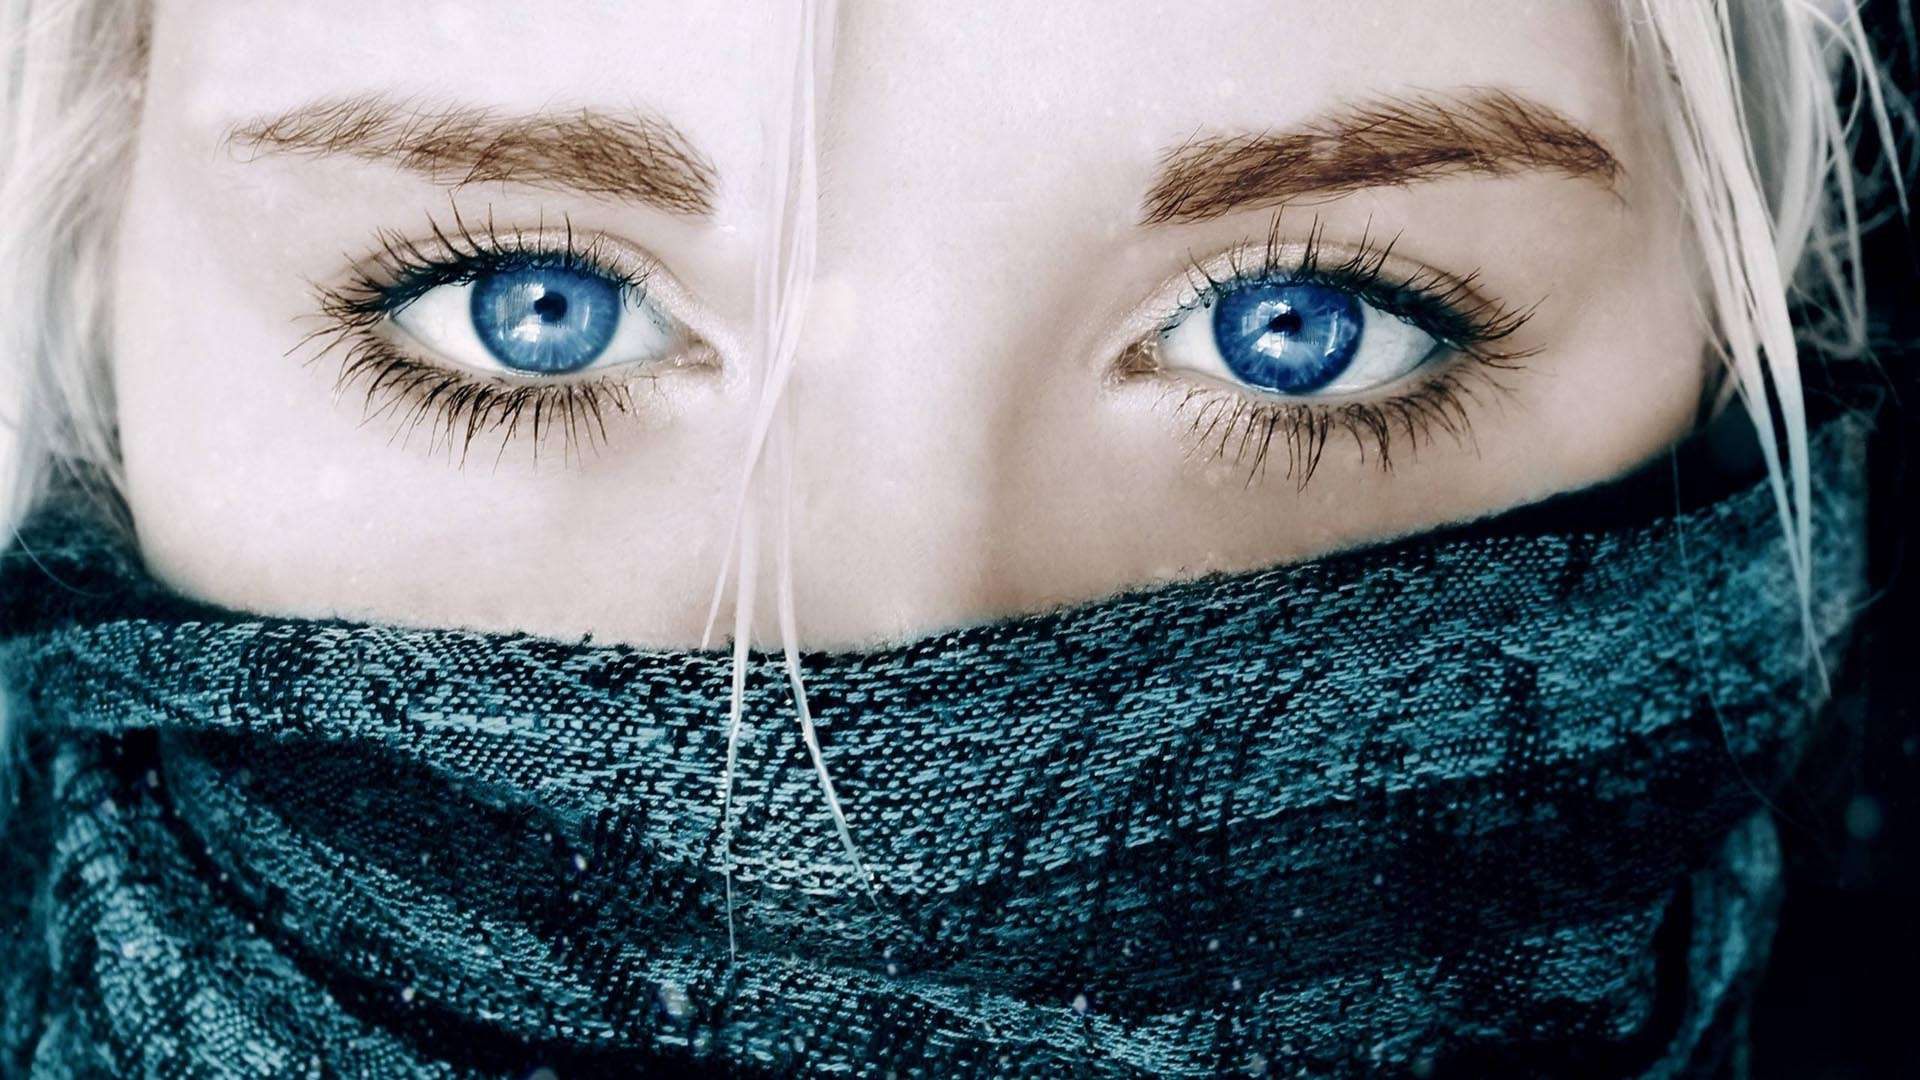 and blue eyes HD Wallpaper FullHDWpp   Full HD Wallpapers 1920x1080 1920x1080